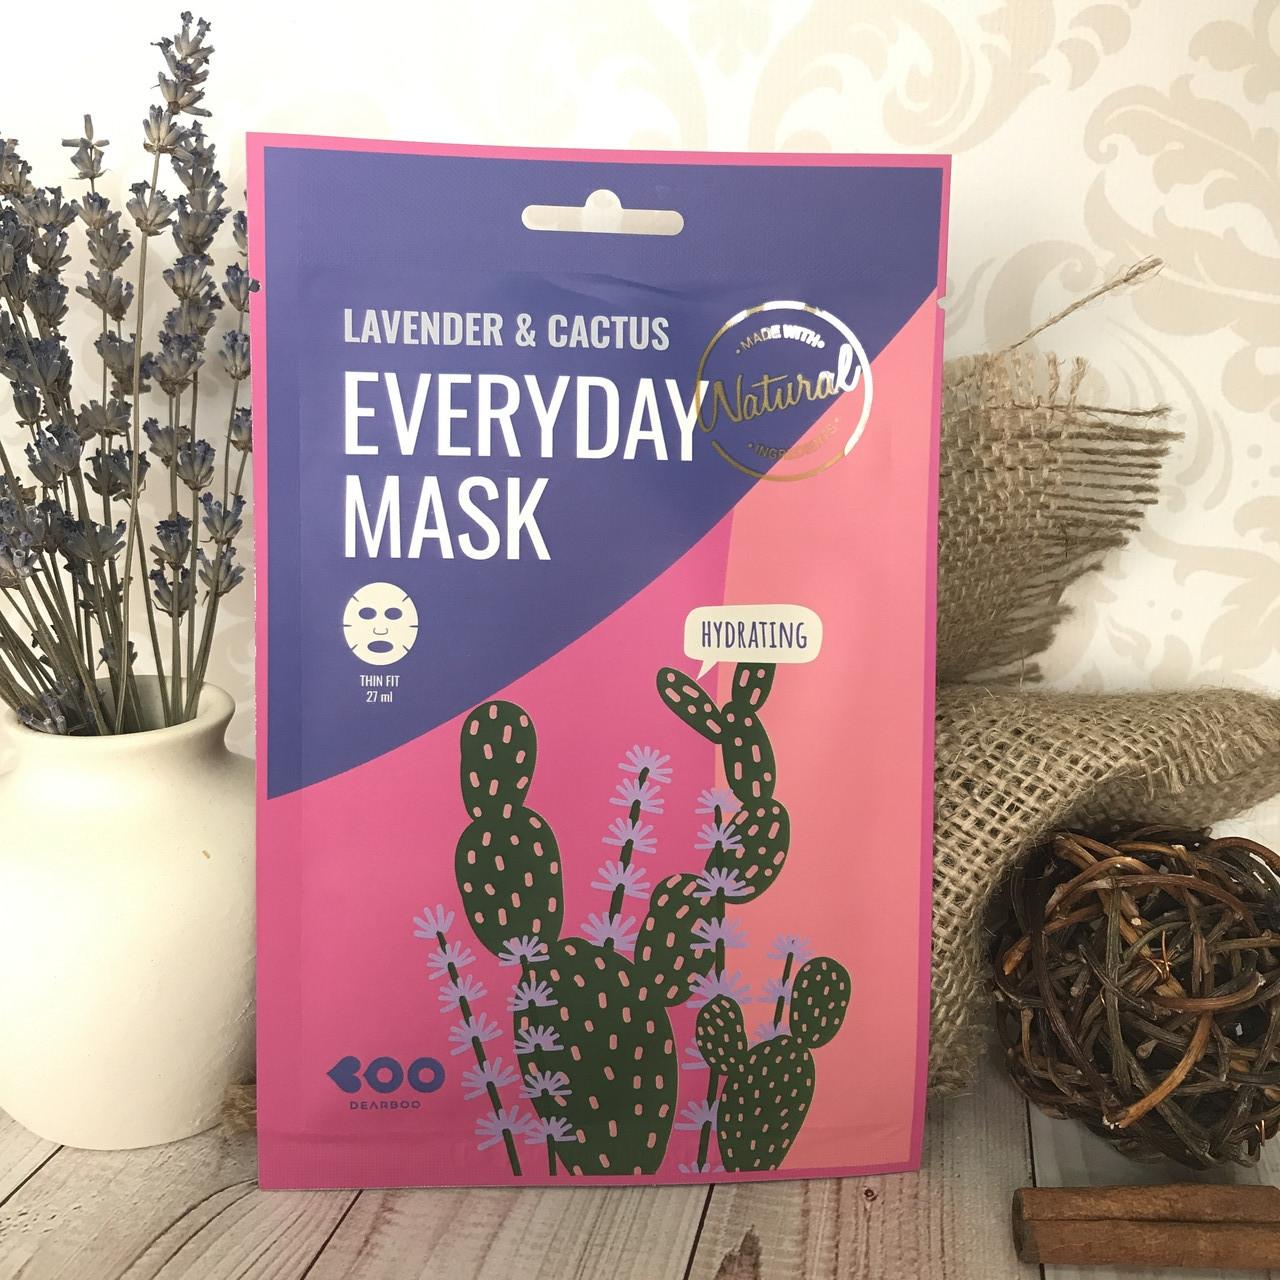 Увлажняющая маска Dearboo с экстрактами лаванды и кактуса Lavender & Cactus Everyday Mask